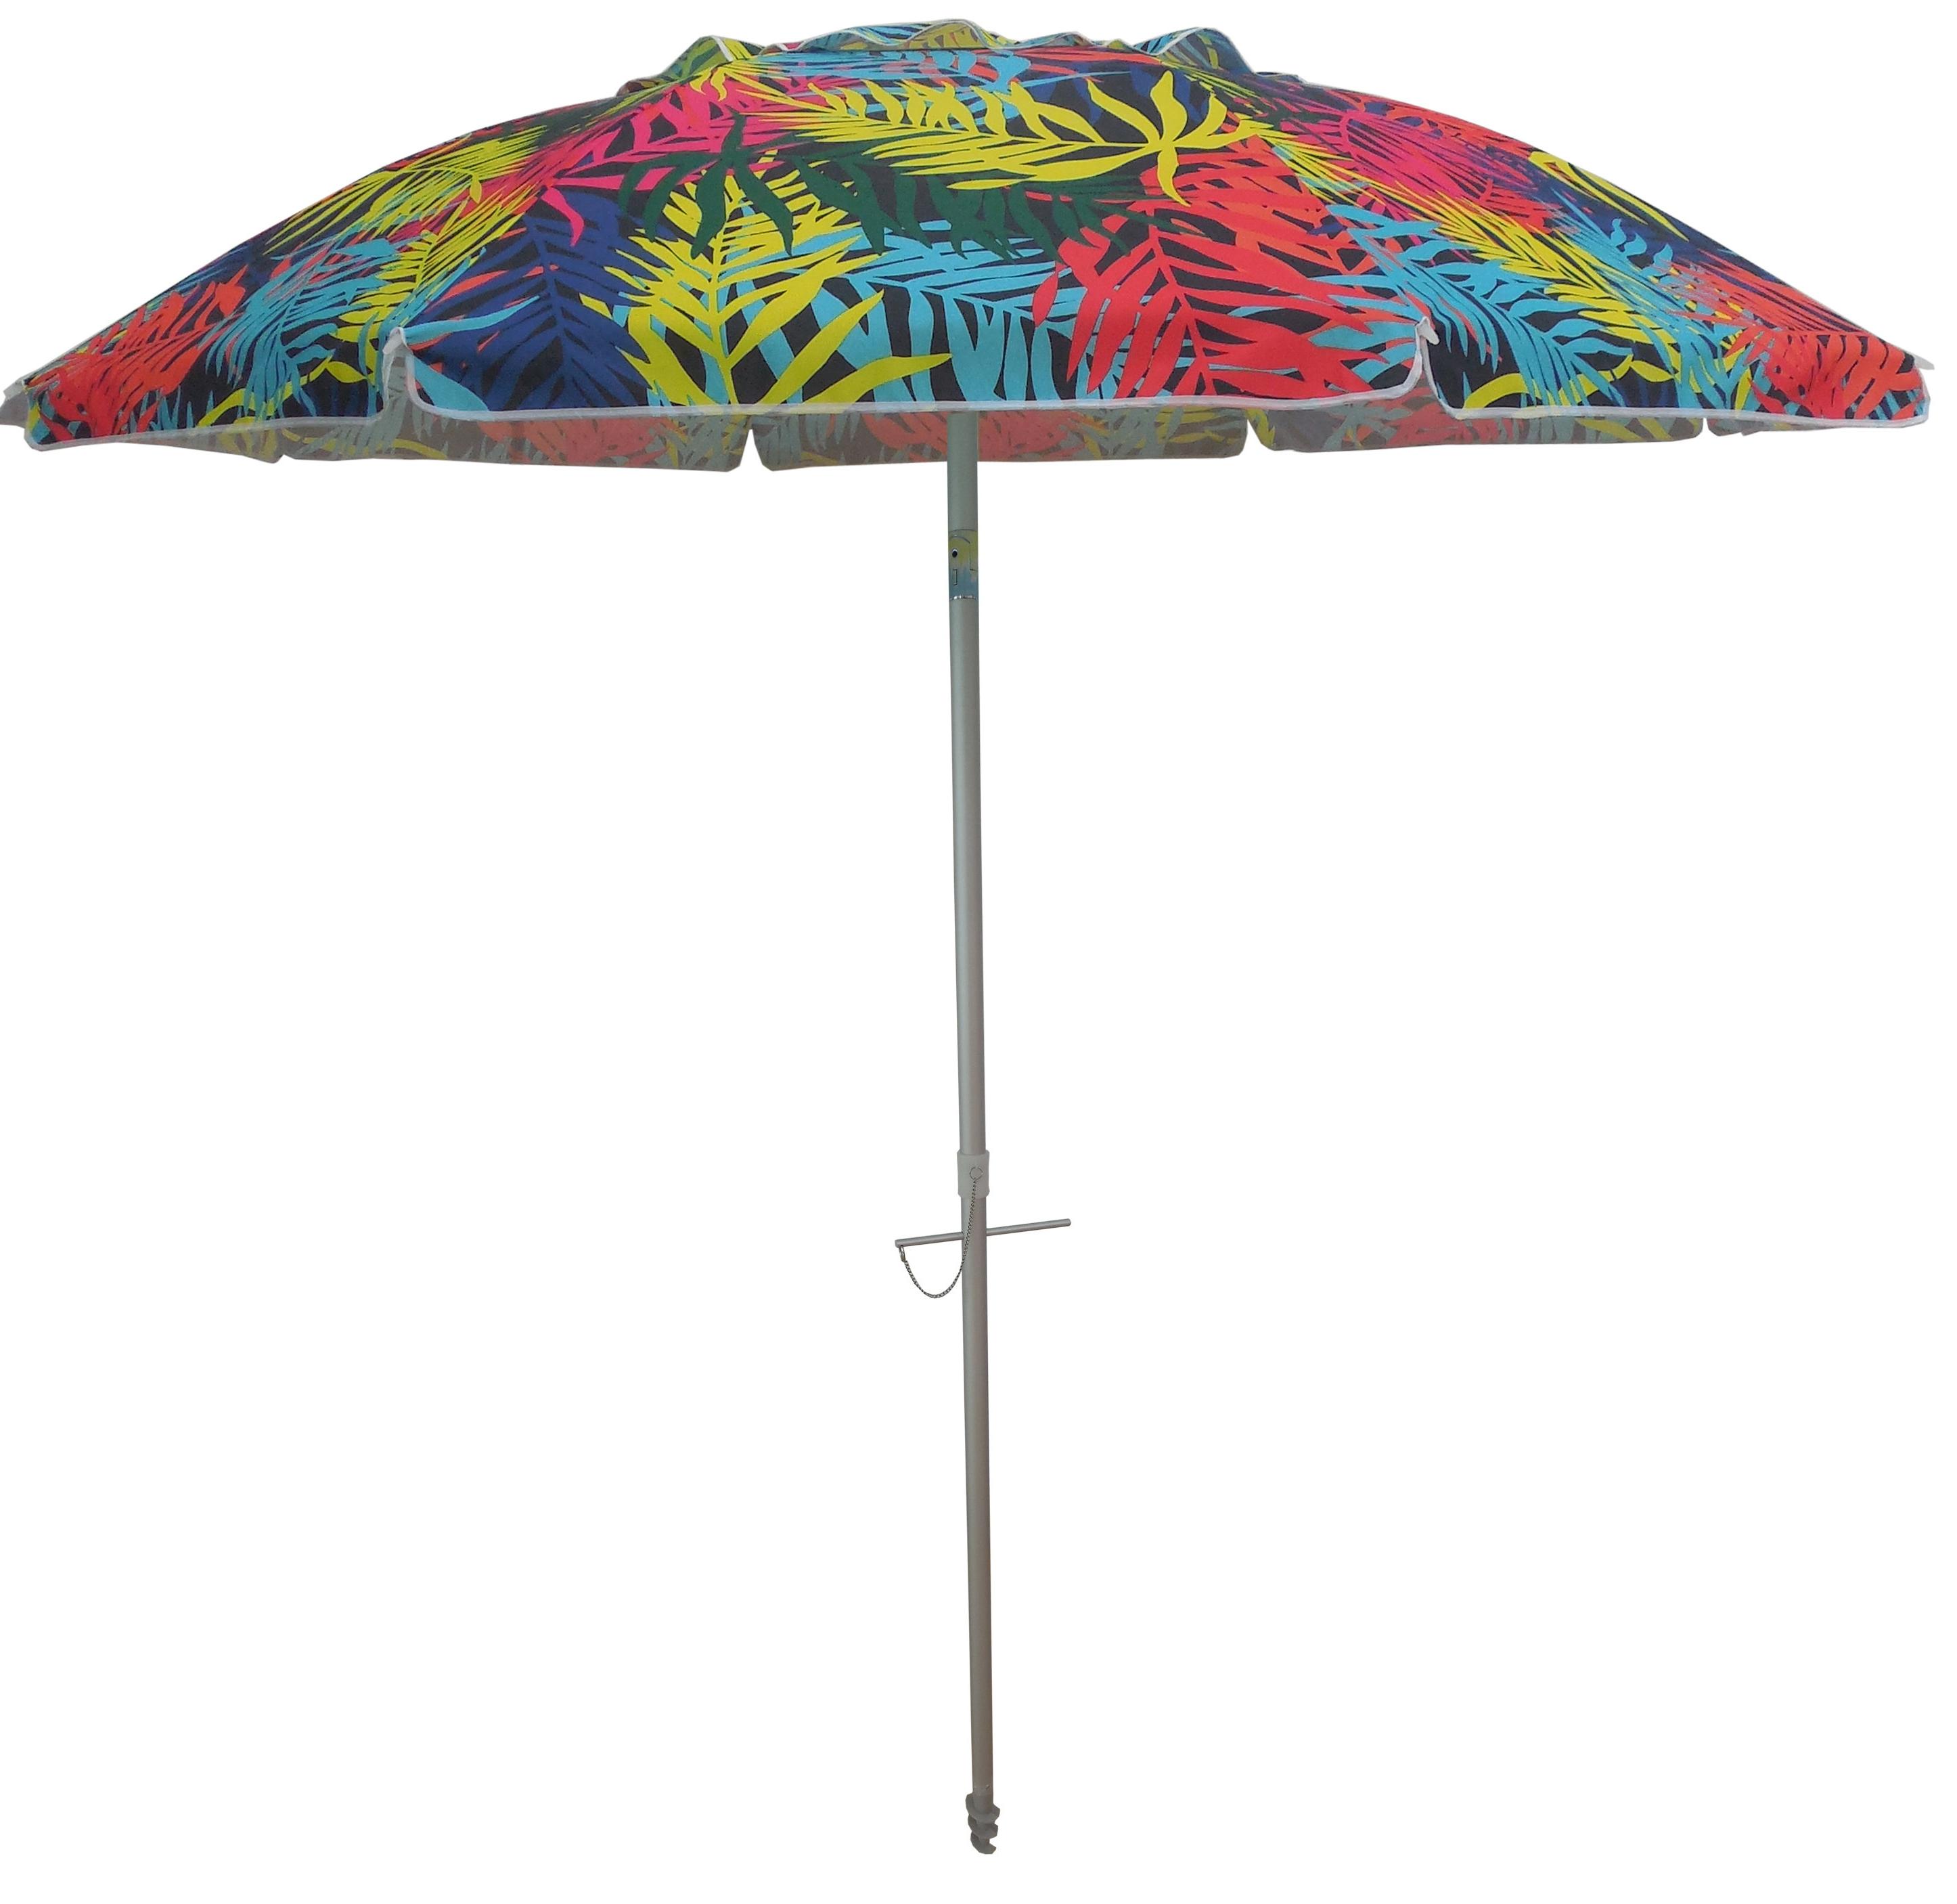 Best And Newest Capra Beach Umbrellas In Tropical Palms 7' Beach Umbrella (View 3 of 20)